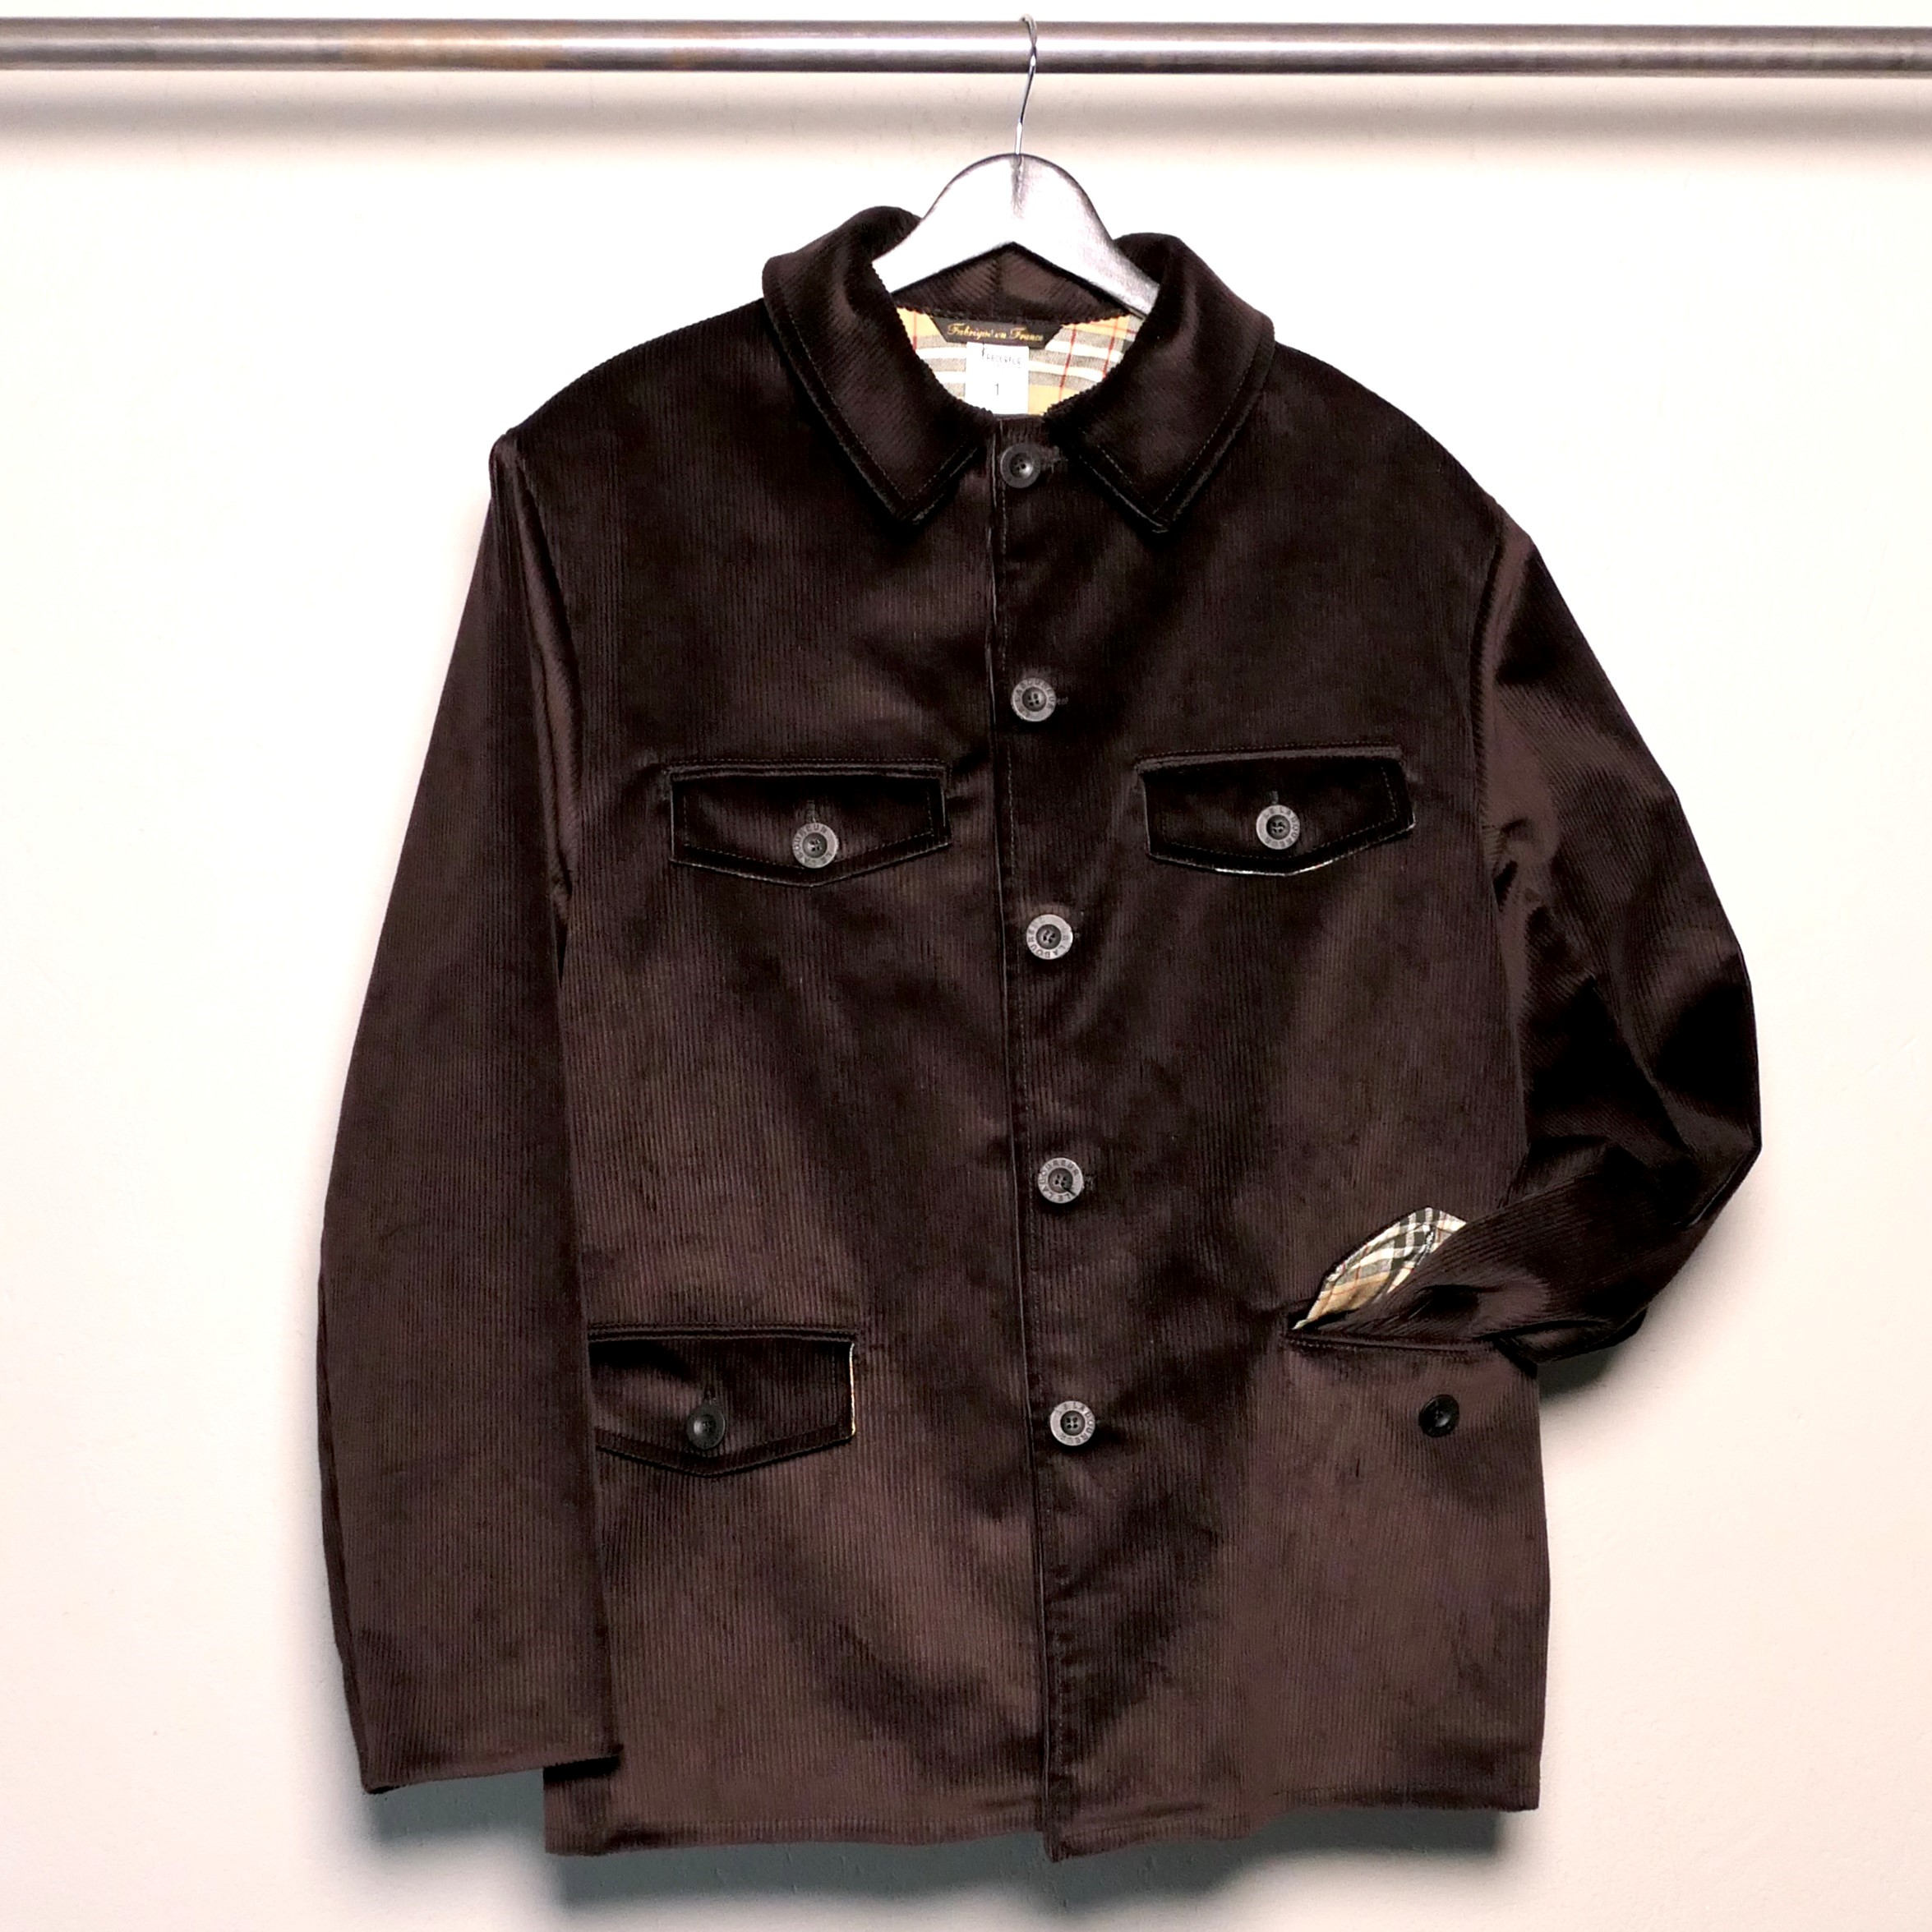 Original Craftsman's Jacket BROWN